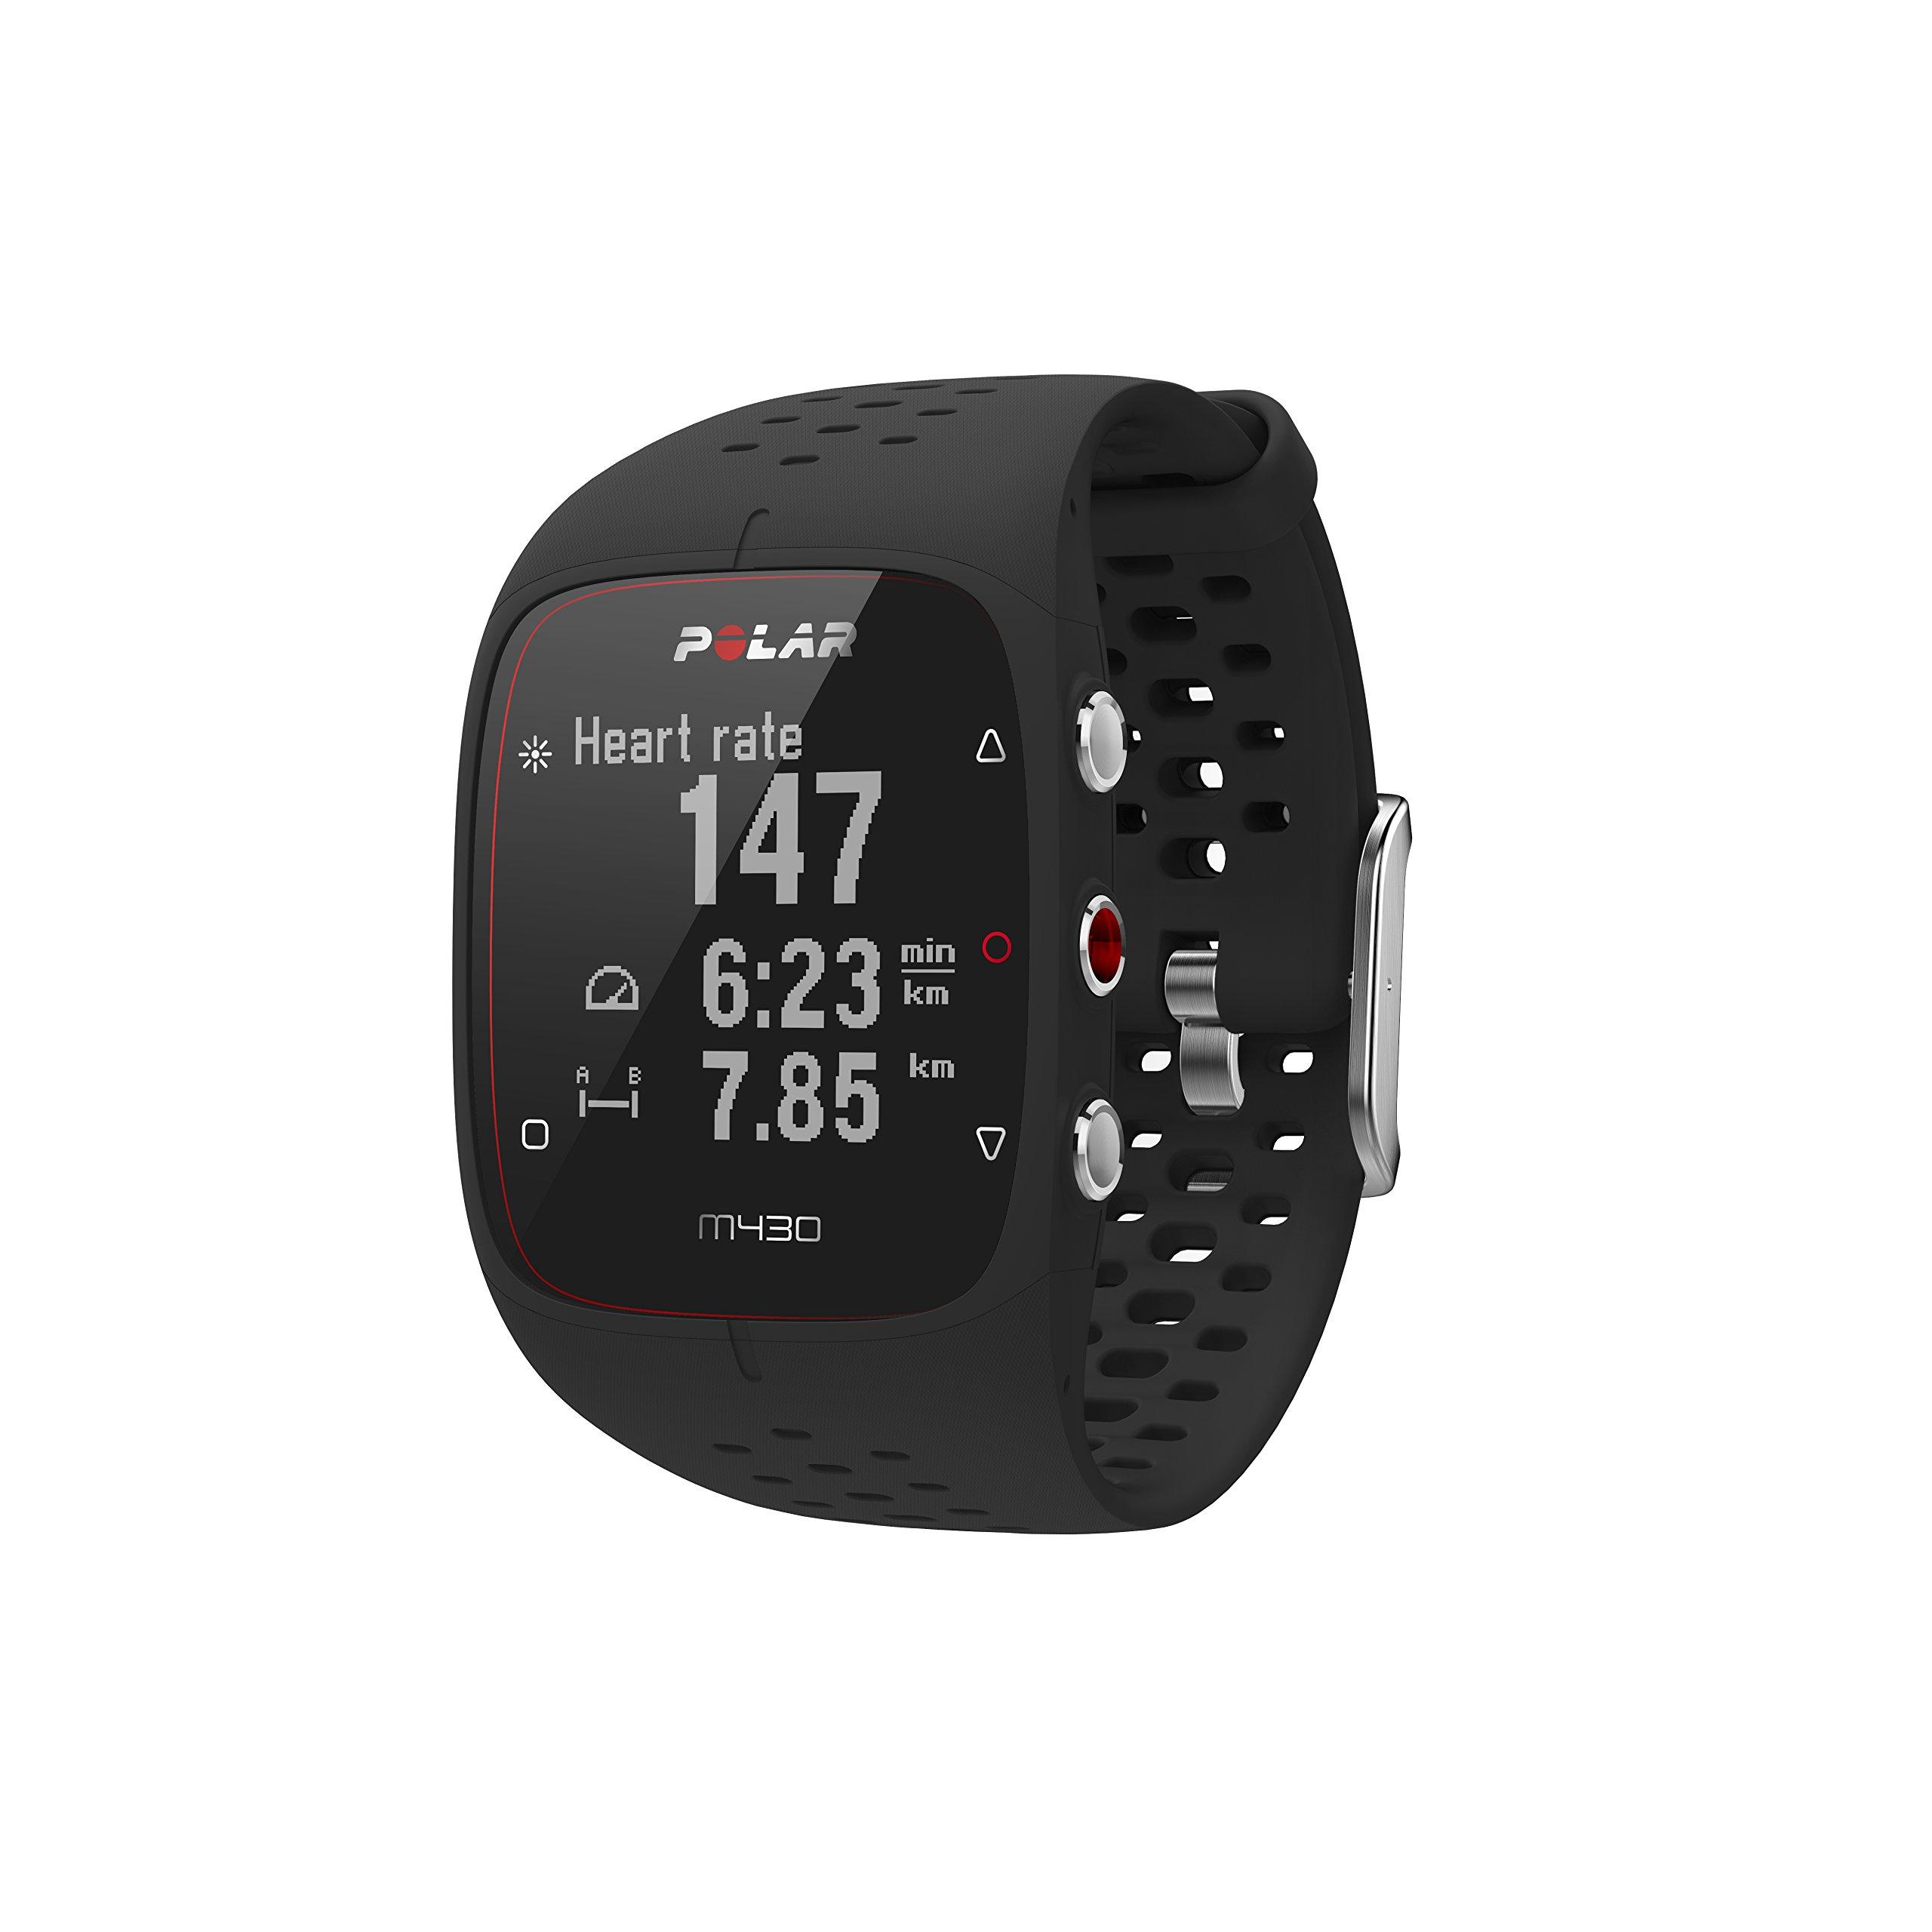 Polar M430 GPS Running Watch, Black by Polar